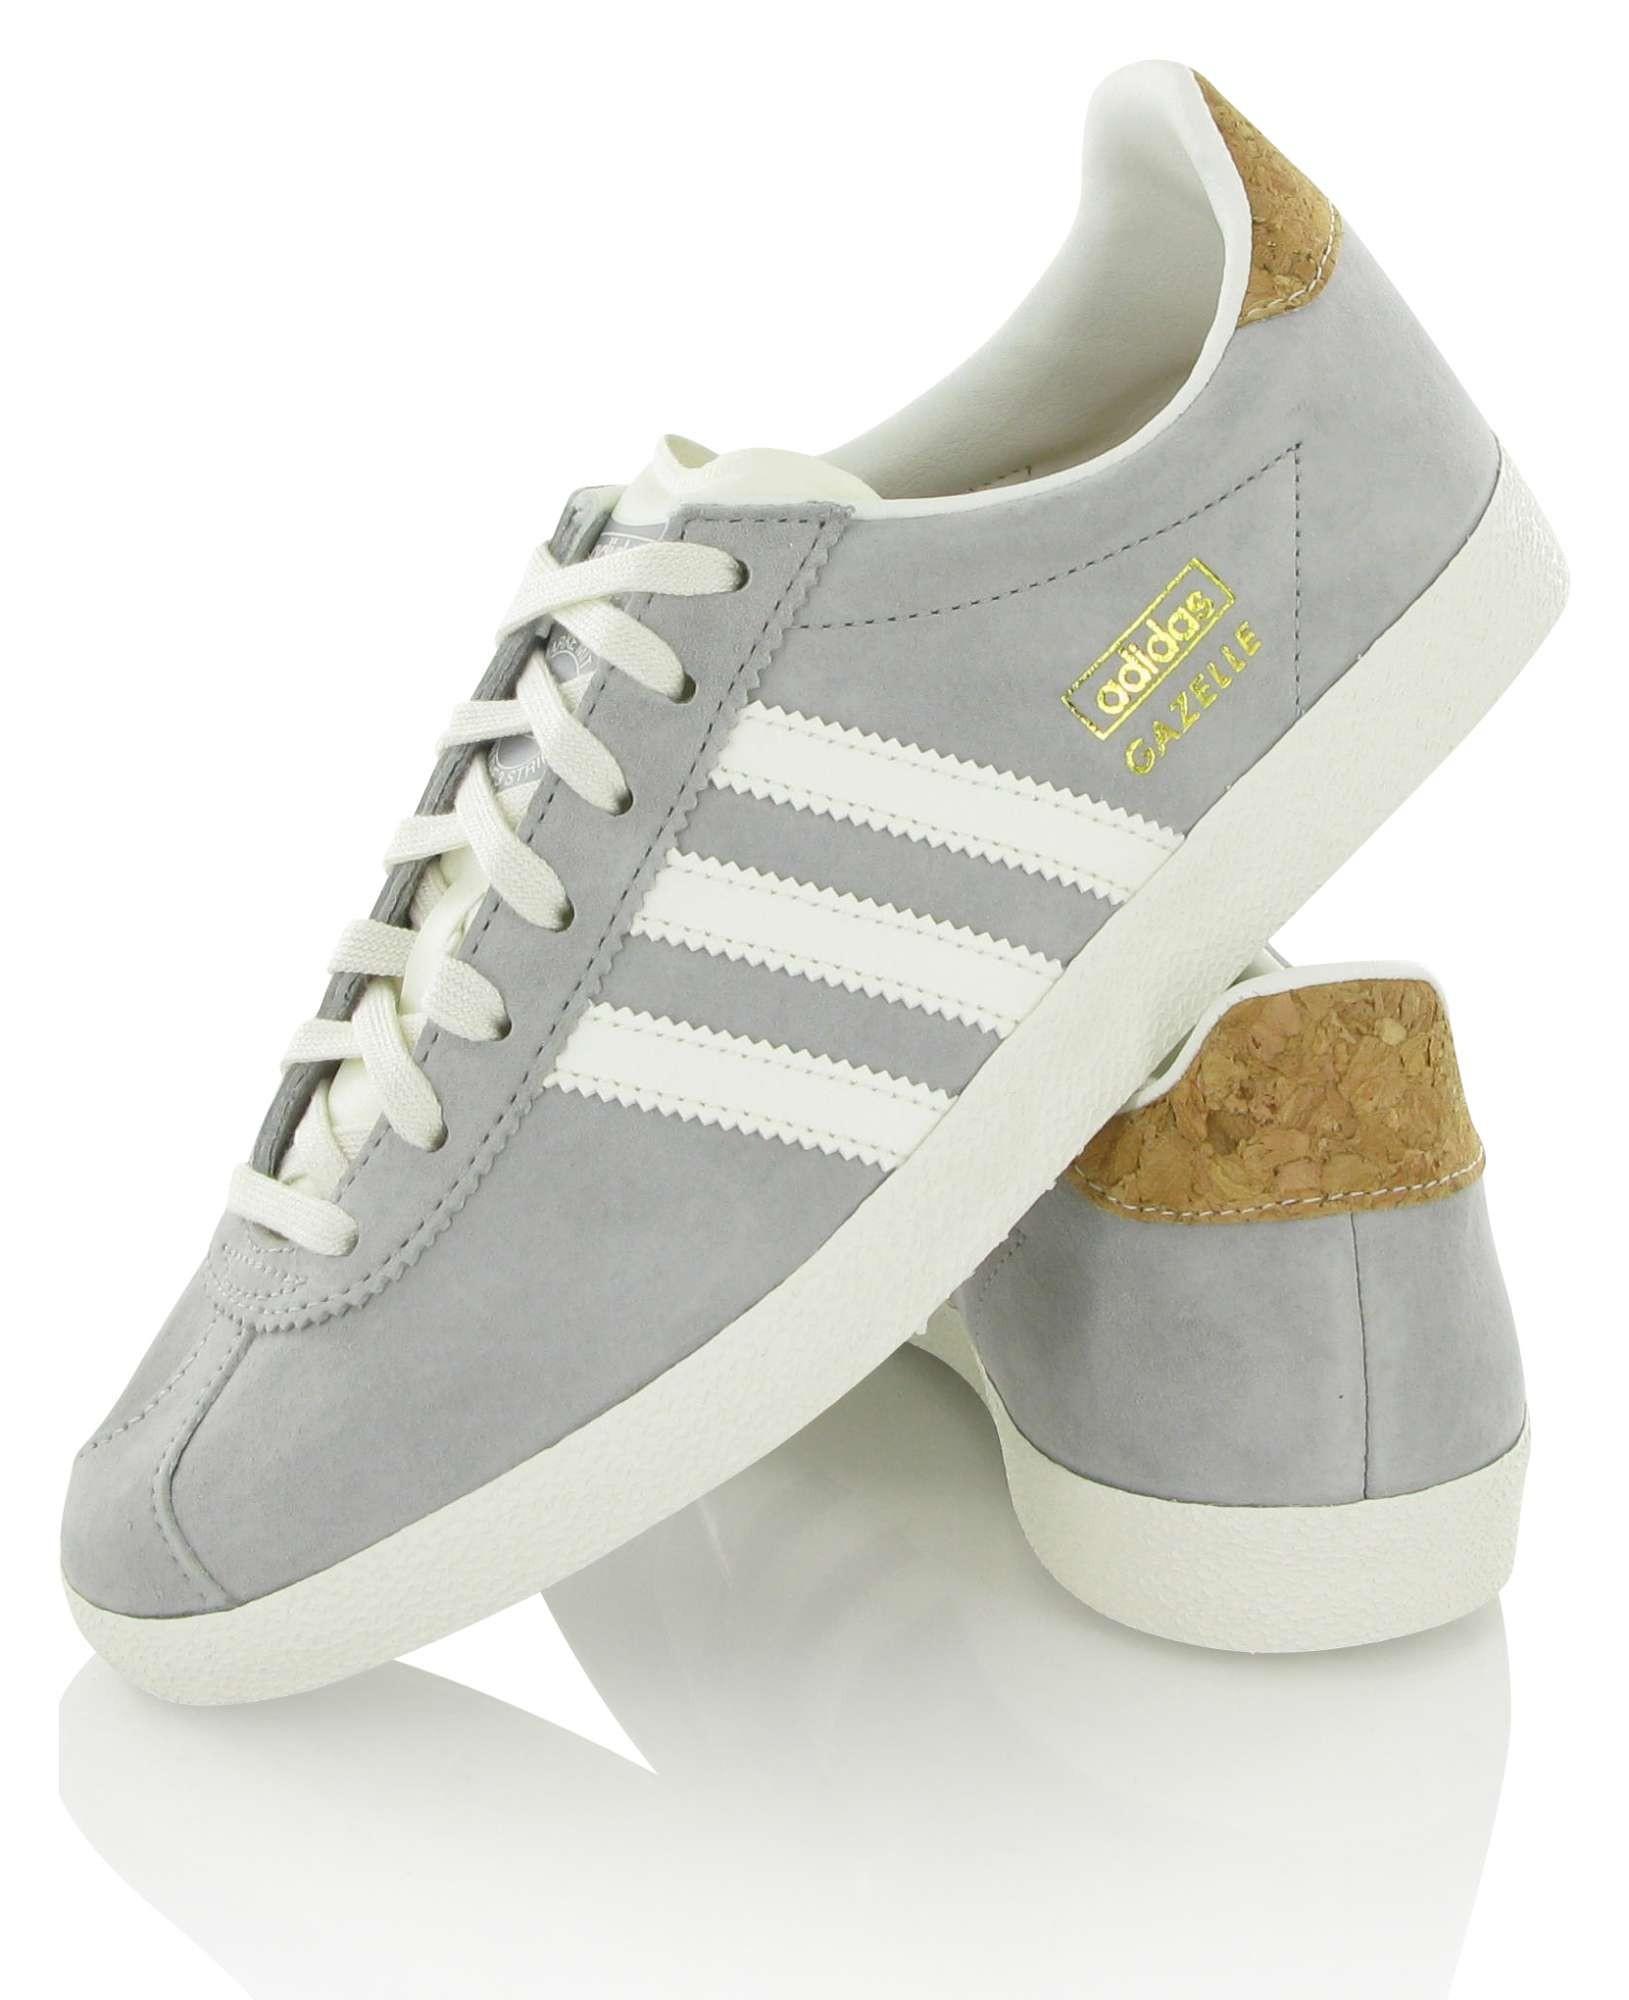 adidas gazelle homme grise